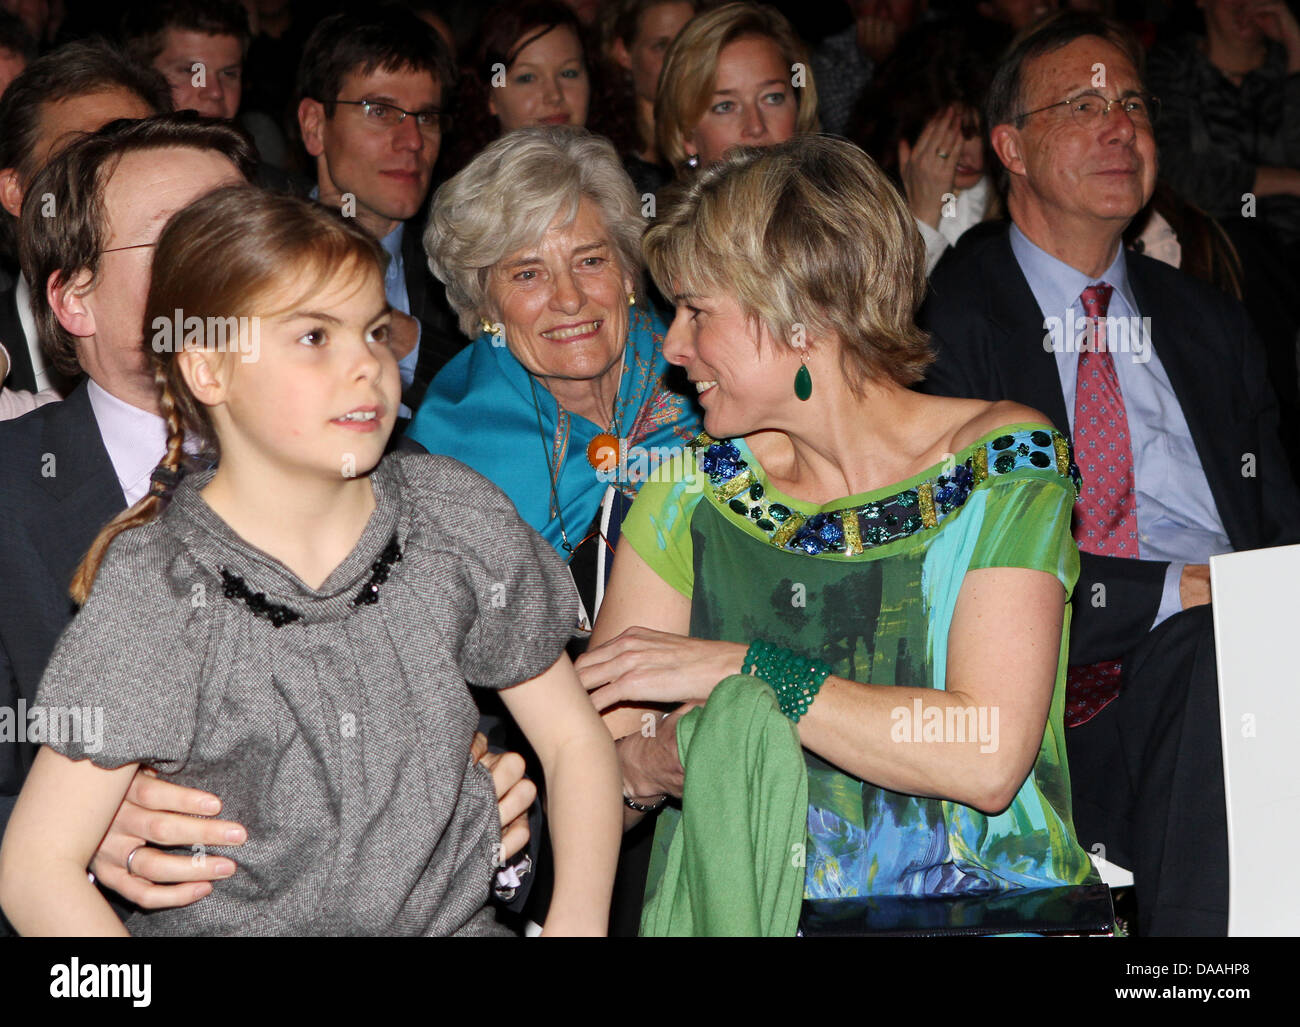 Dutch Princess Constantijn (L-R), daugher Countess Eloise and Princess Laurentien with her parents Jantien and Laurens - Stock Image